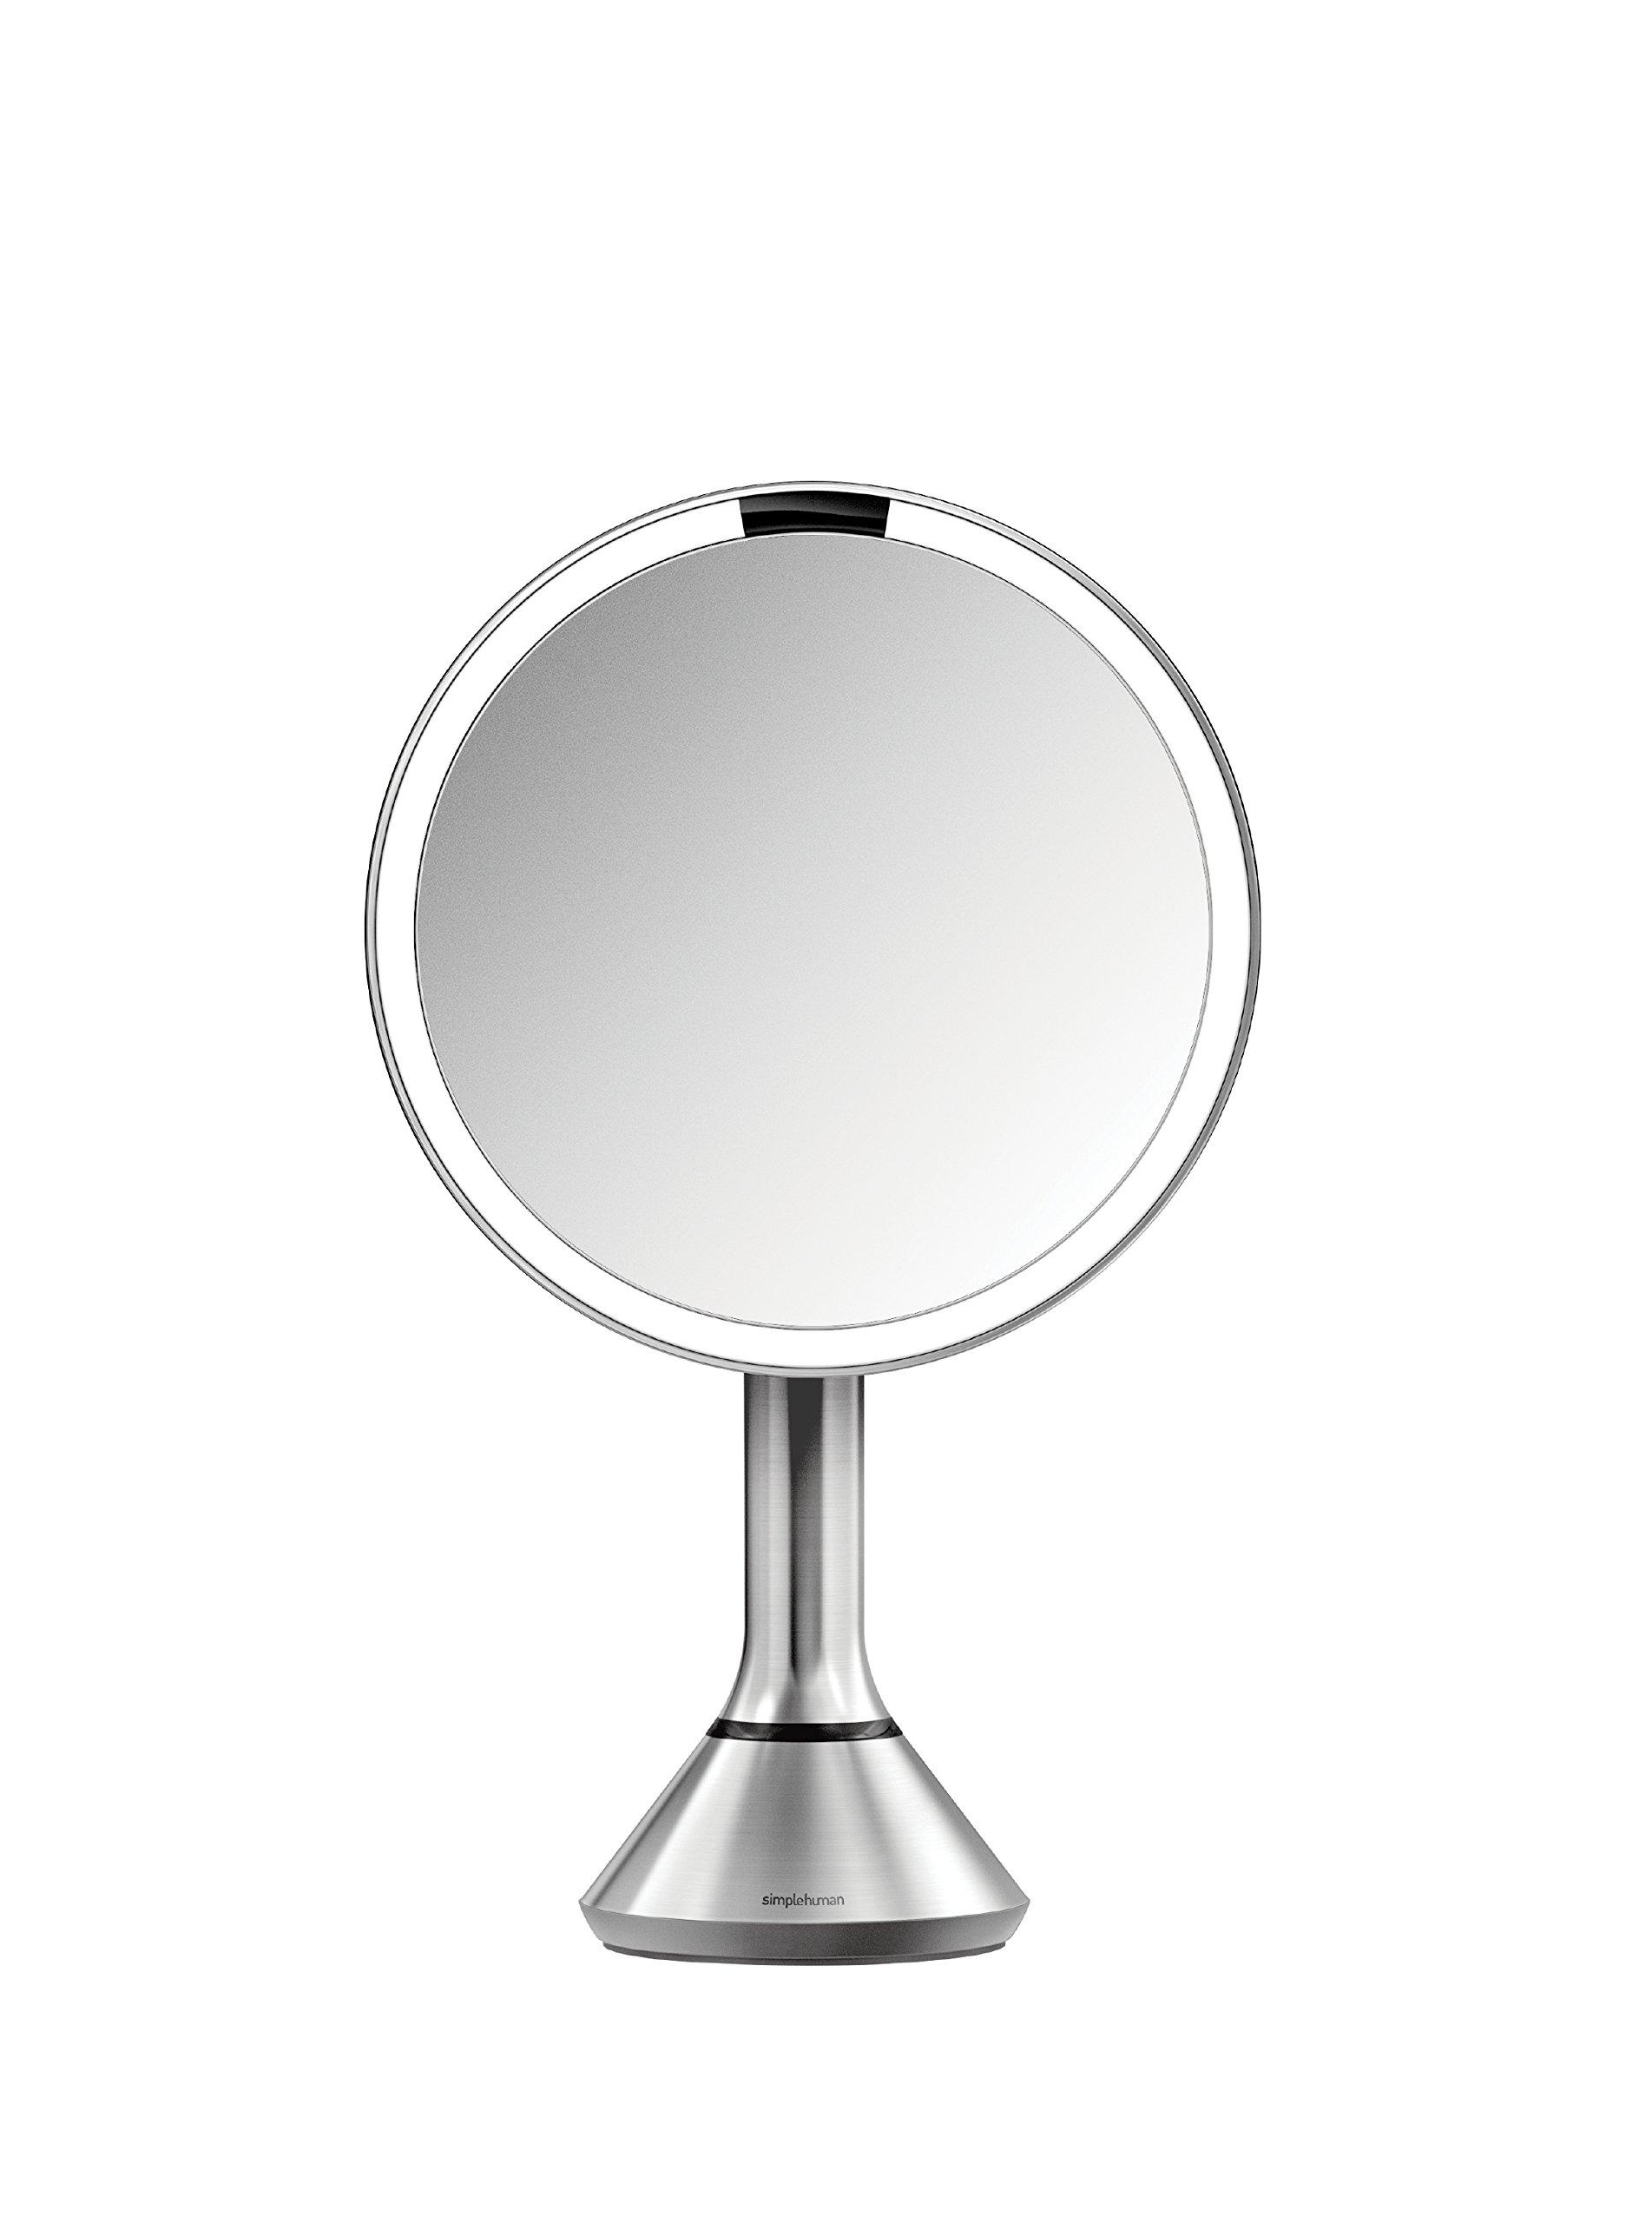 Galleon - Simplehuman Sensor Mirror - Sensor-Activated Lighted Vanity Mirror, 5x Magnification ...